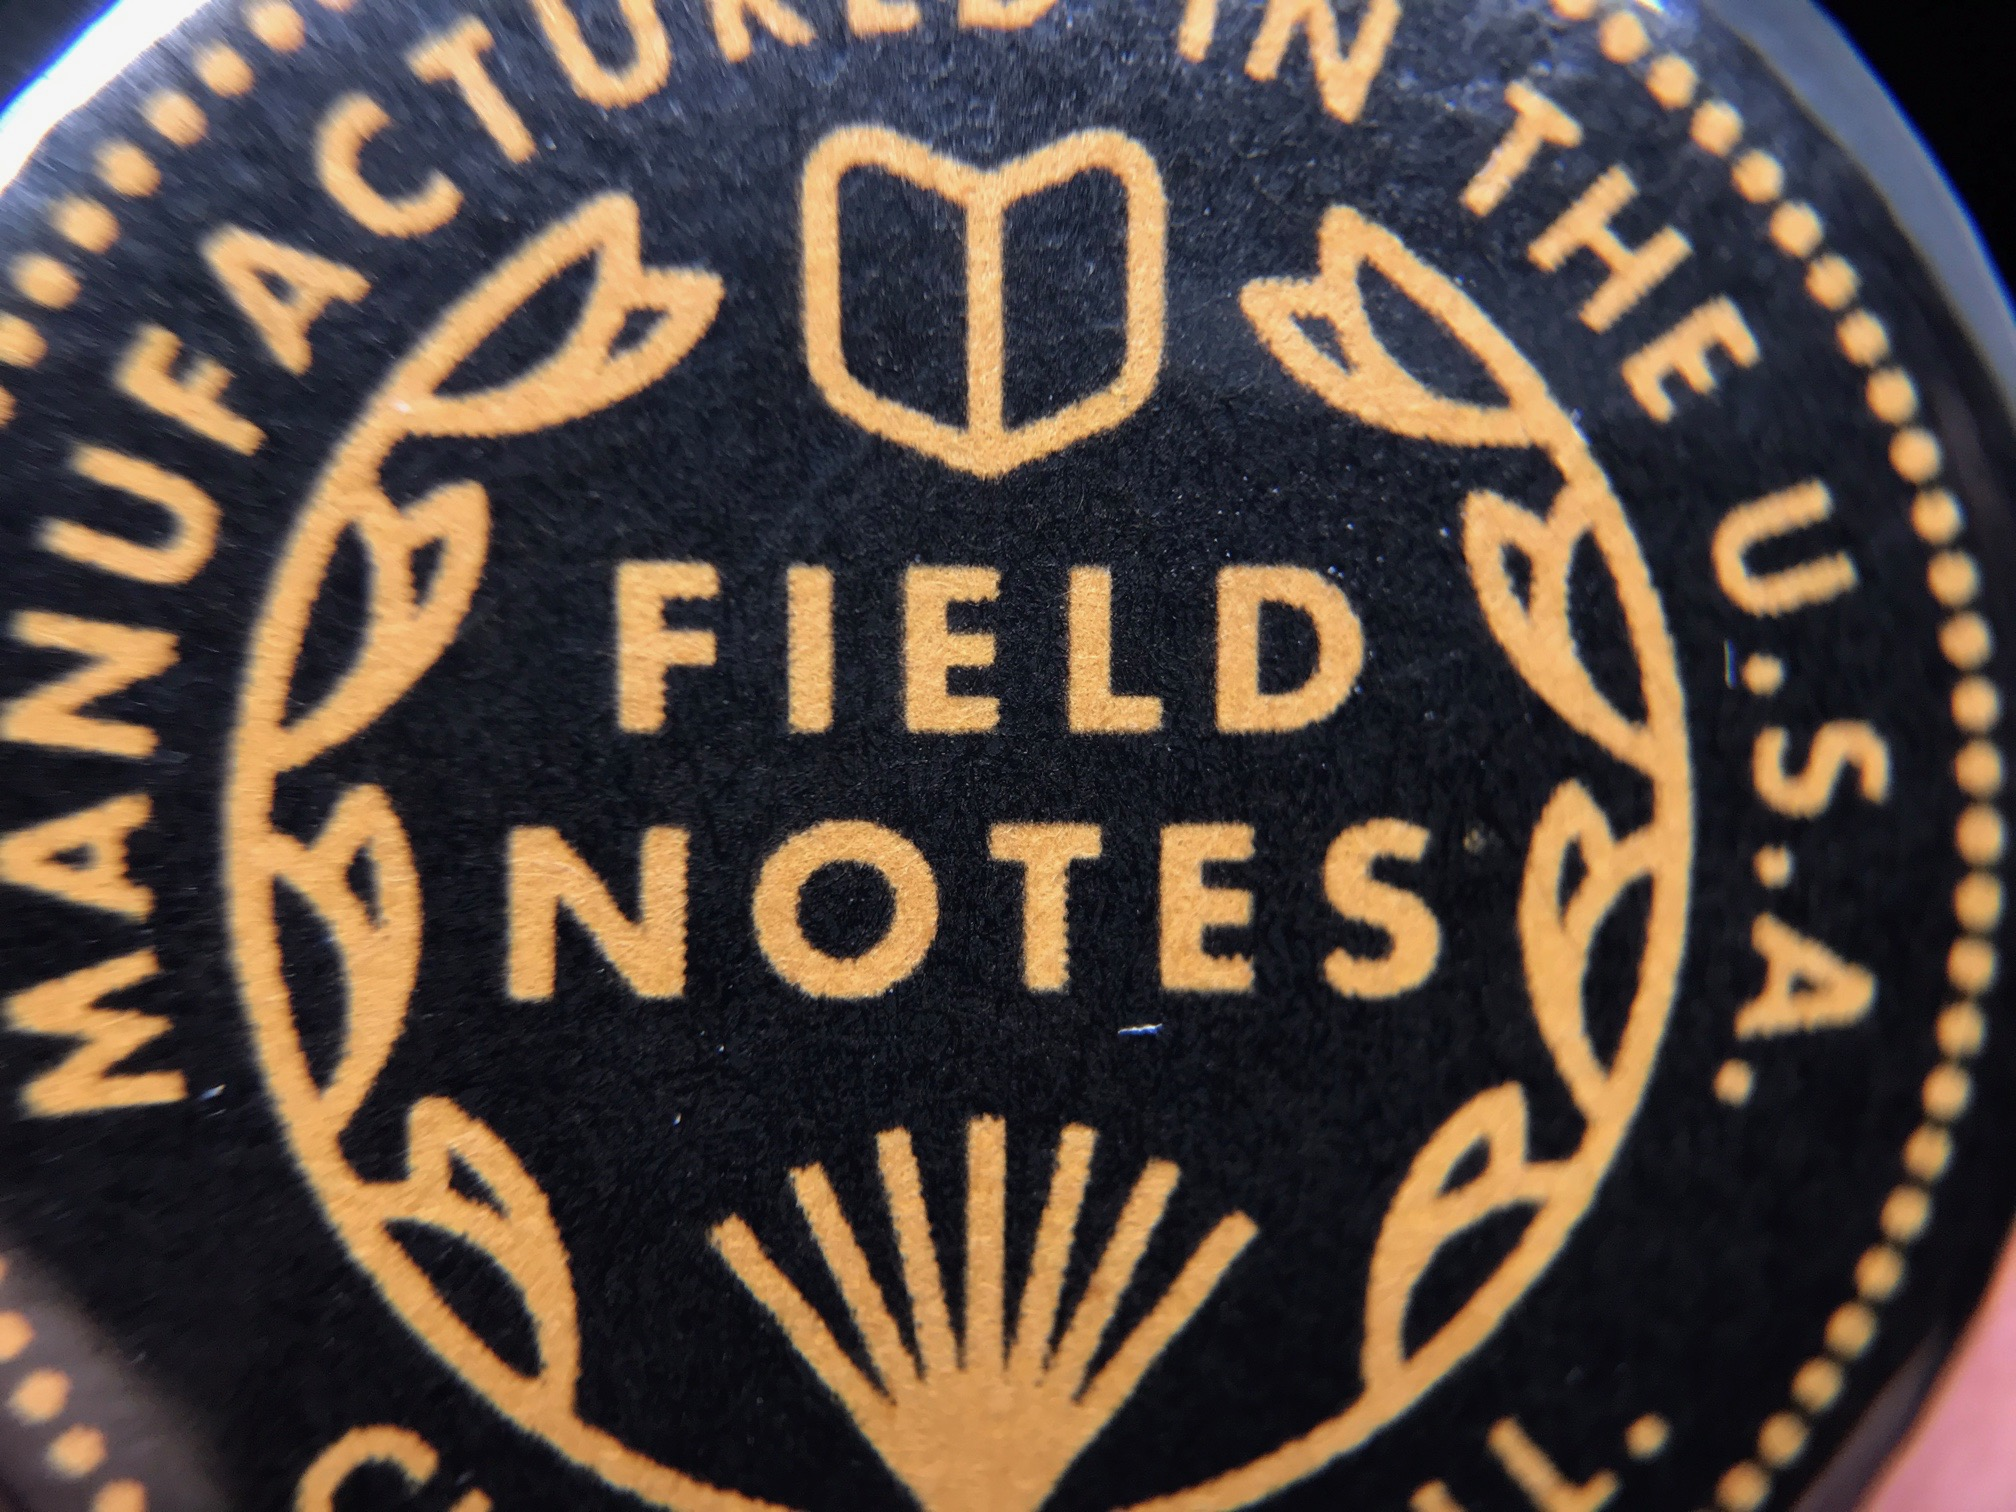 field-notes-dime-novel-17.jpg